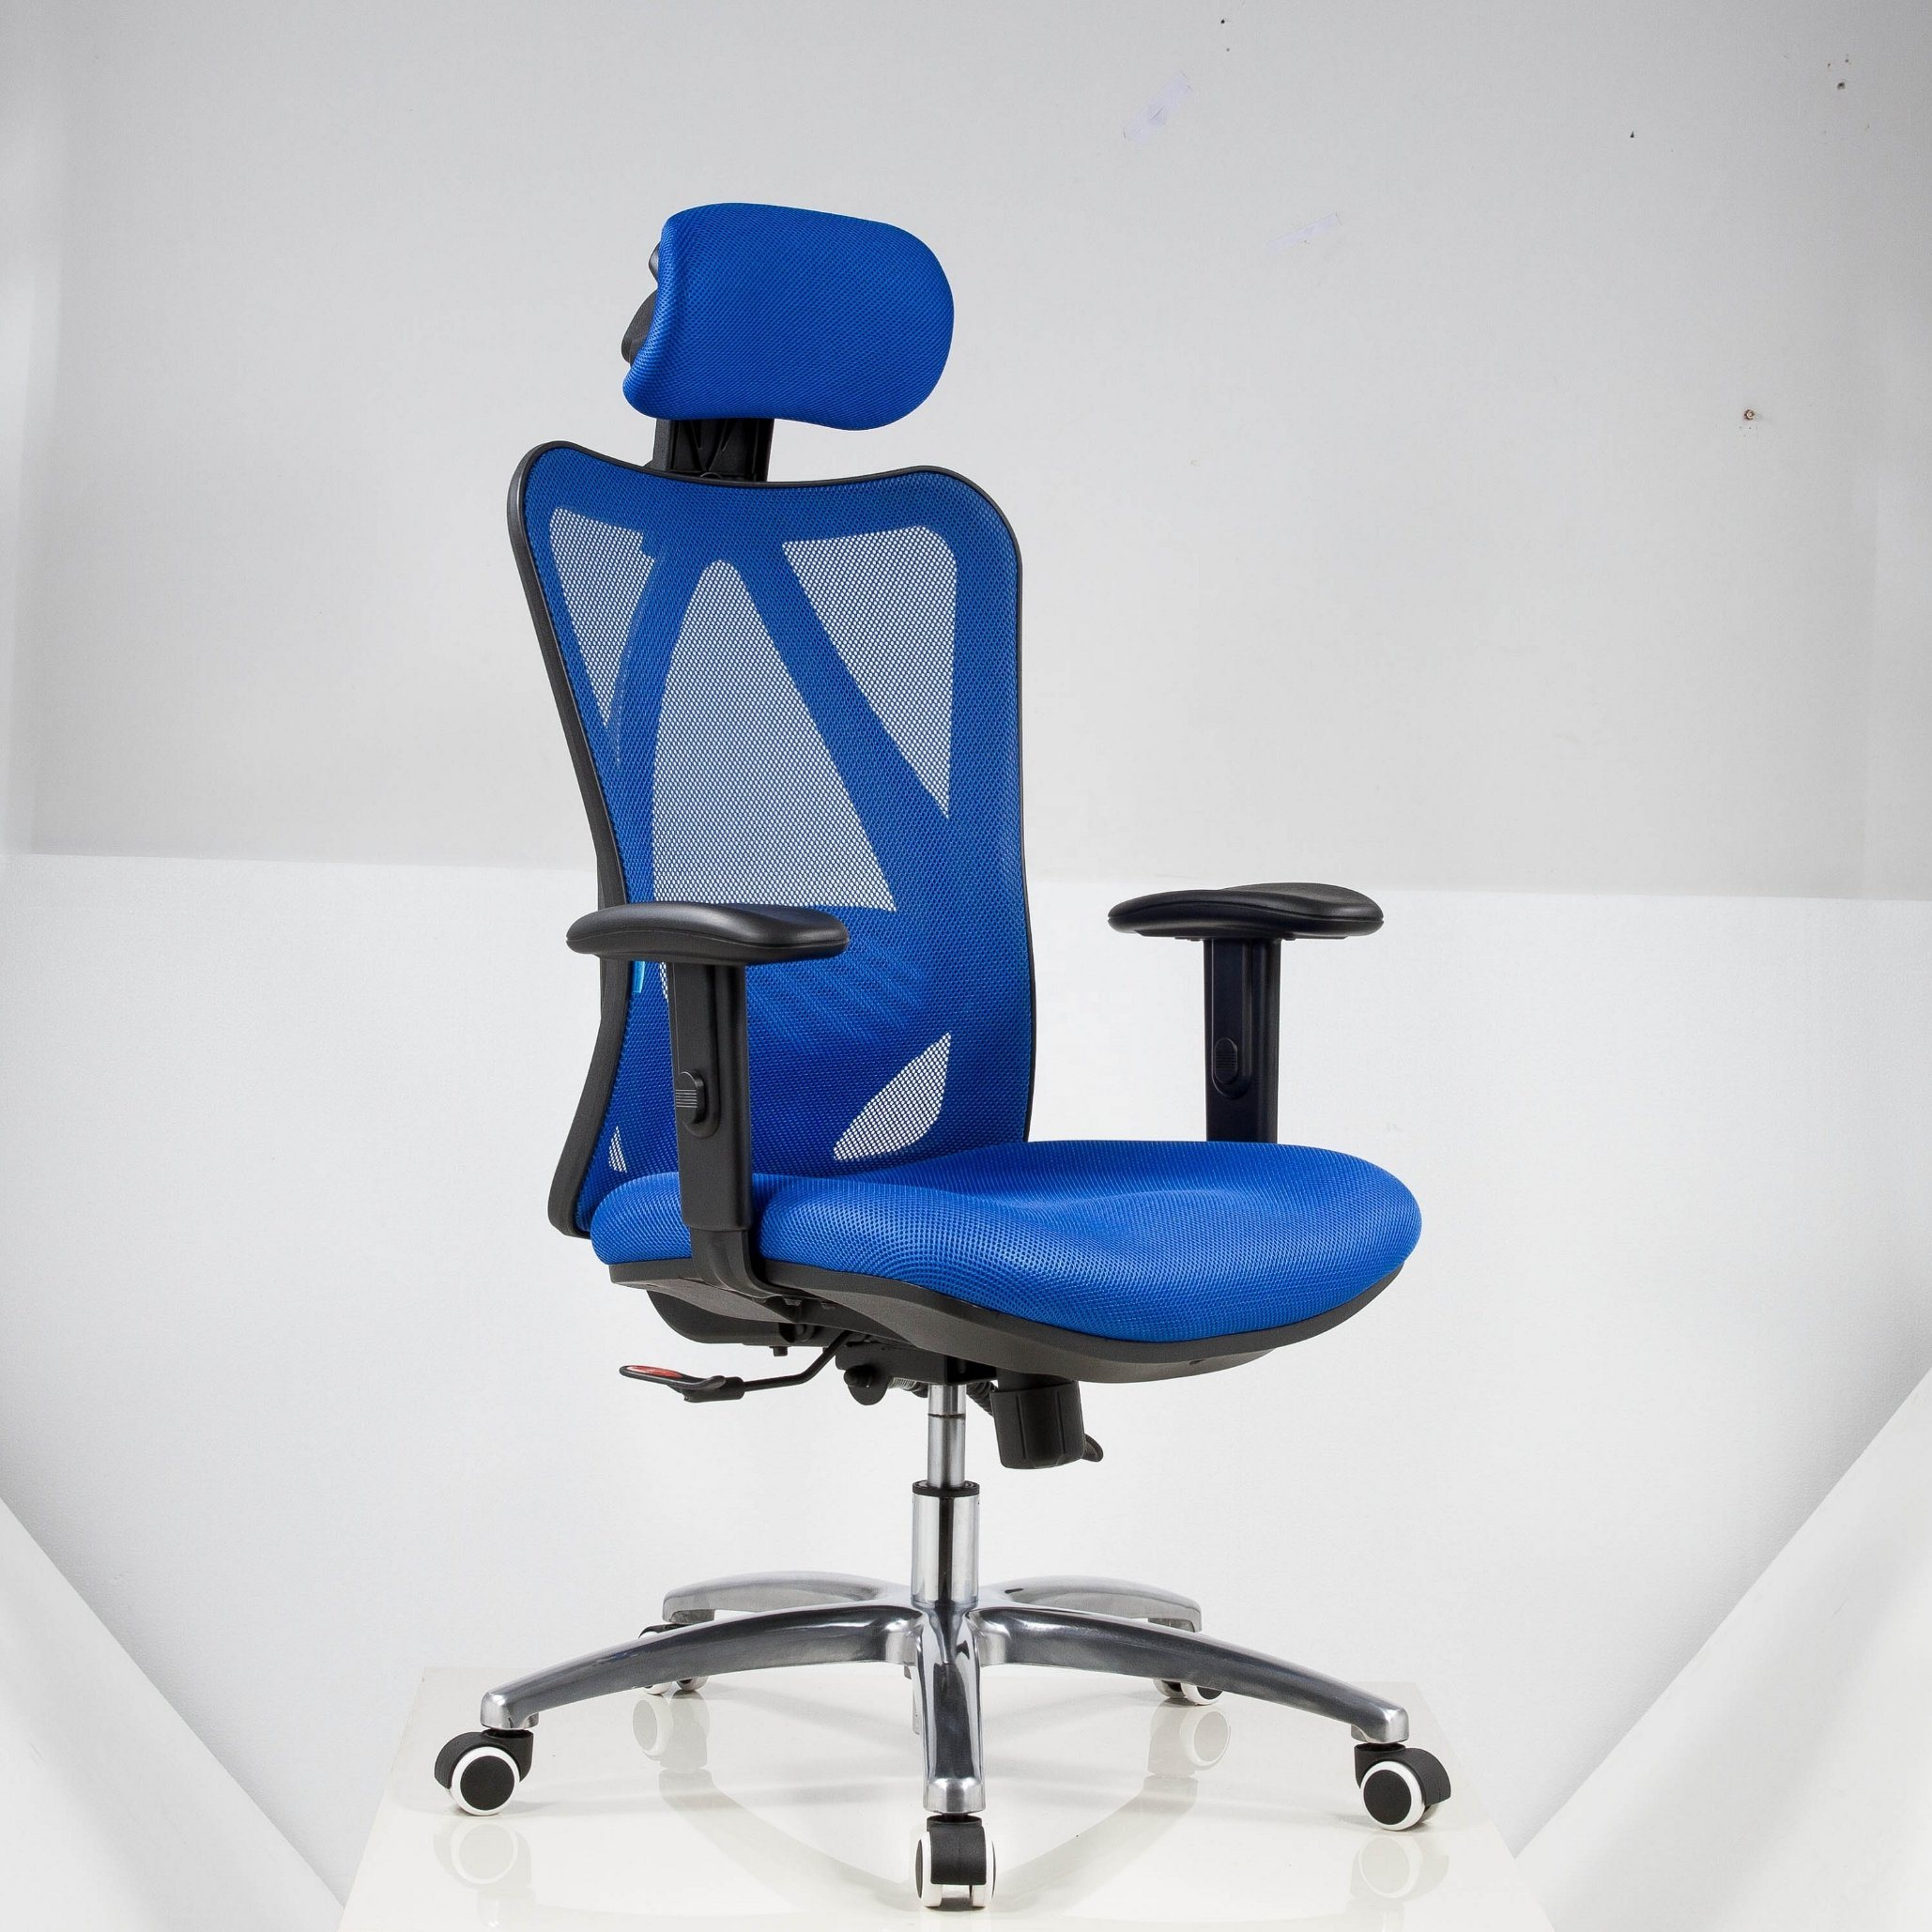 Chegar a cadeiras personalizadas de rodas